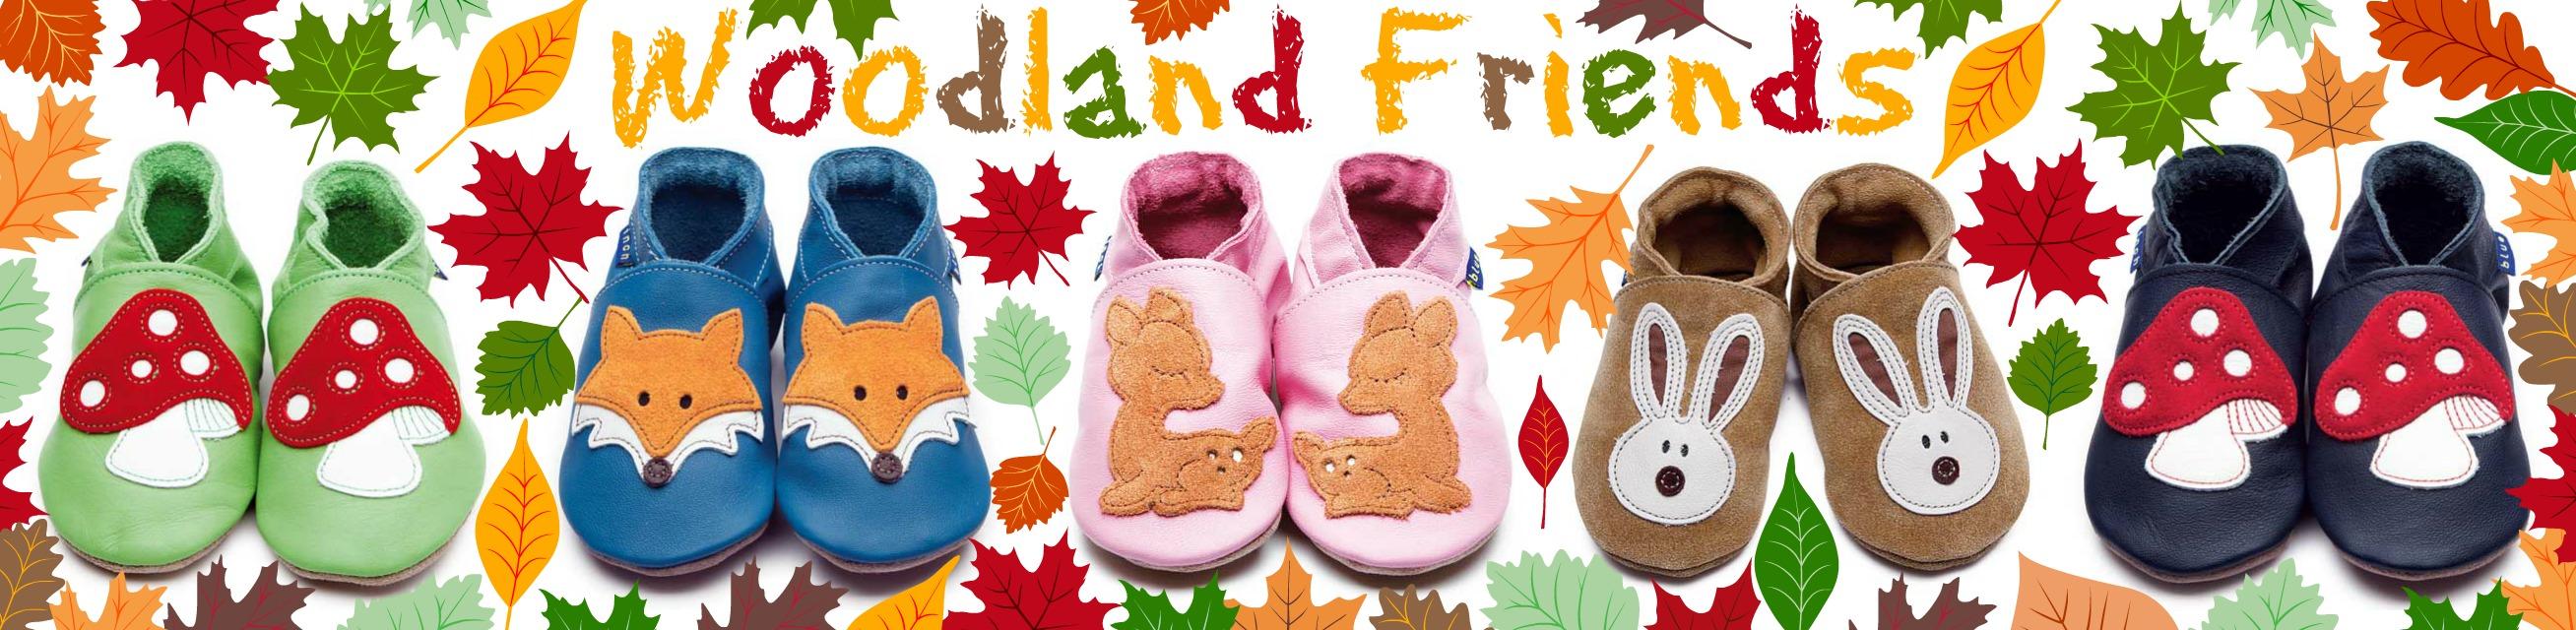 Woodlandfriends-inchblue